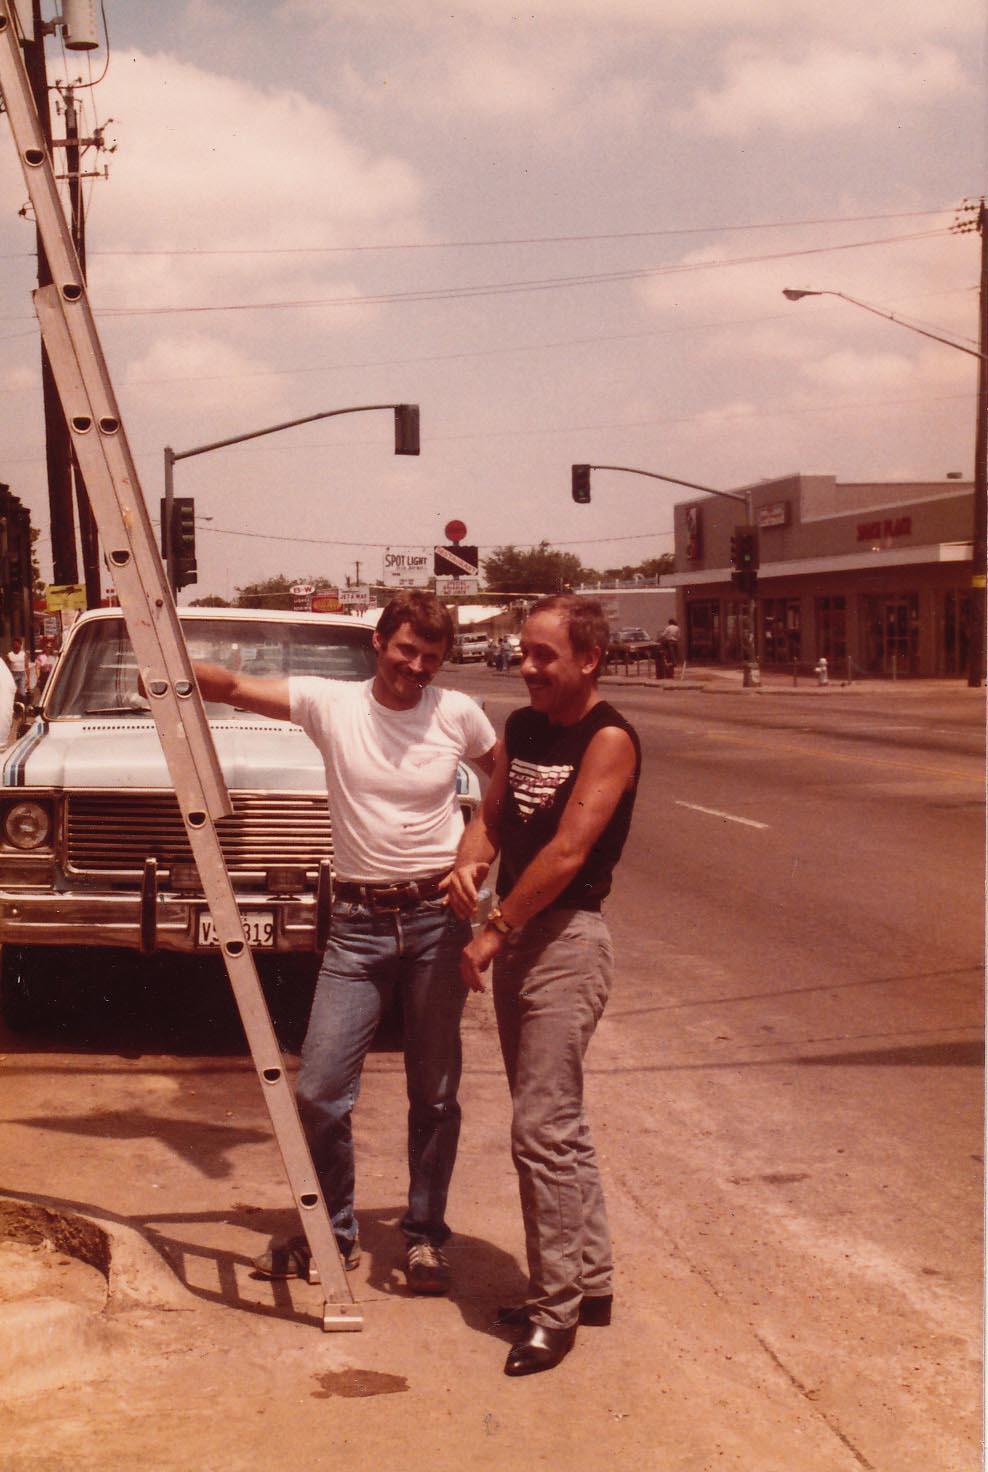 Terry Tebedo and Richard Longstaff